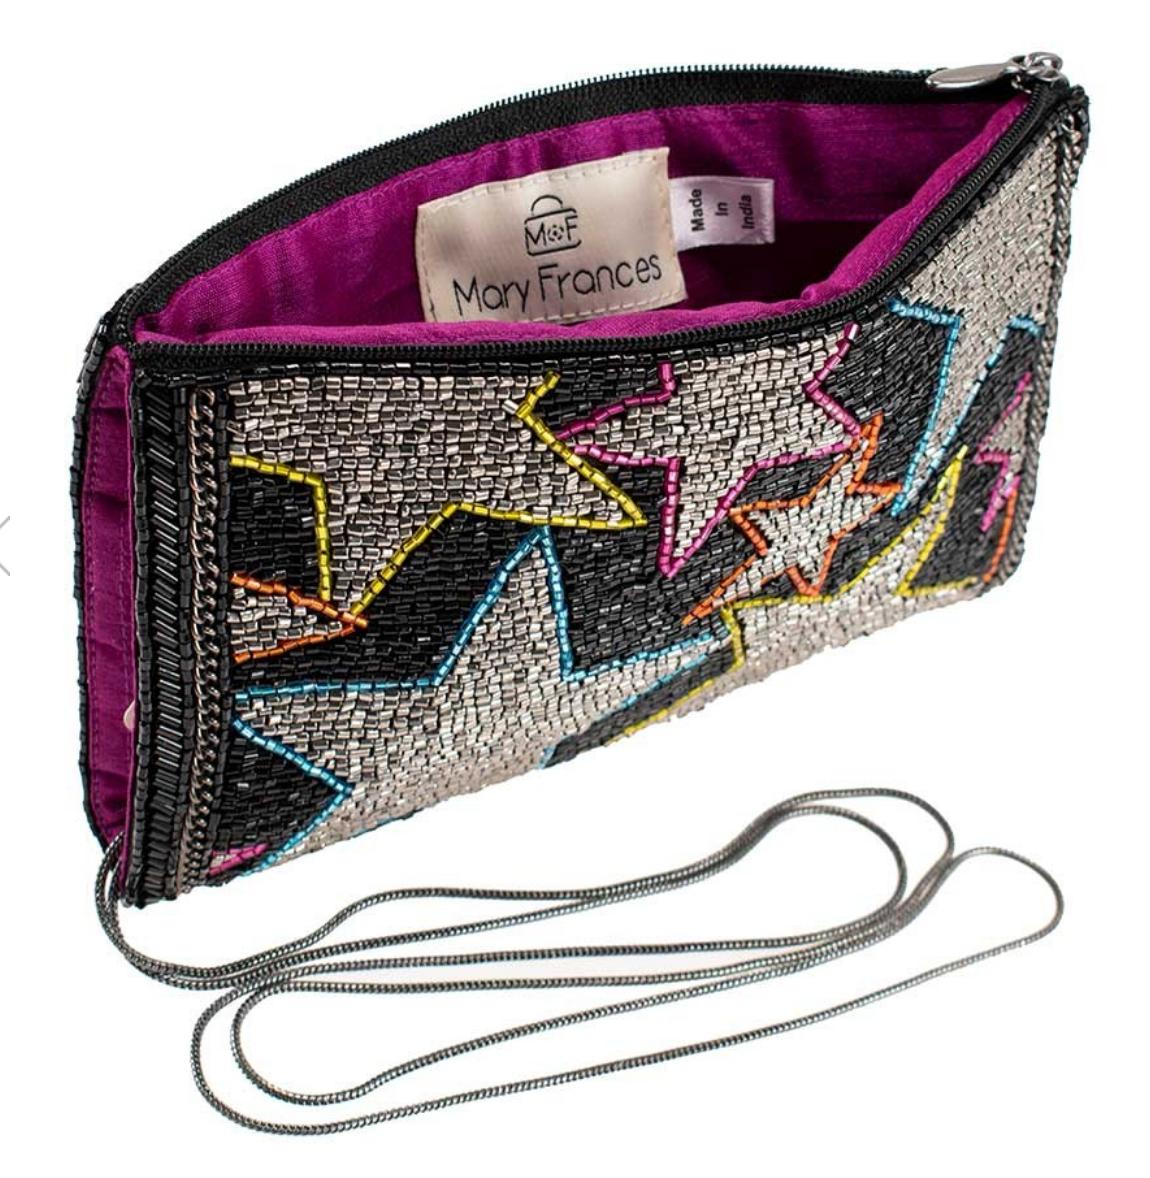 Mary Frances Mary Frances - Seeing Stars Handbag